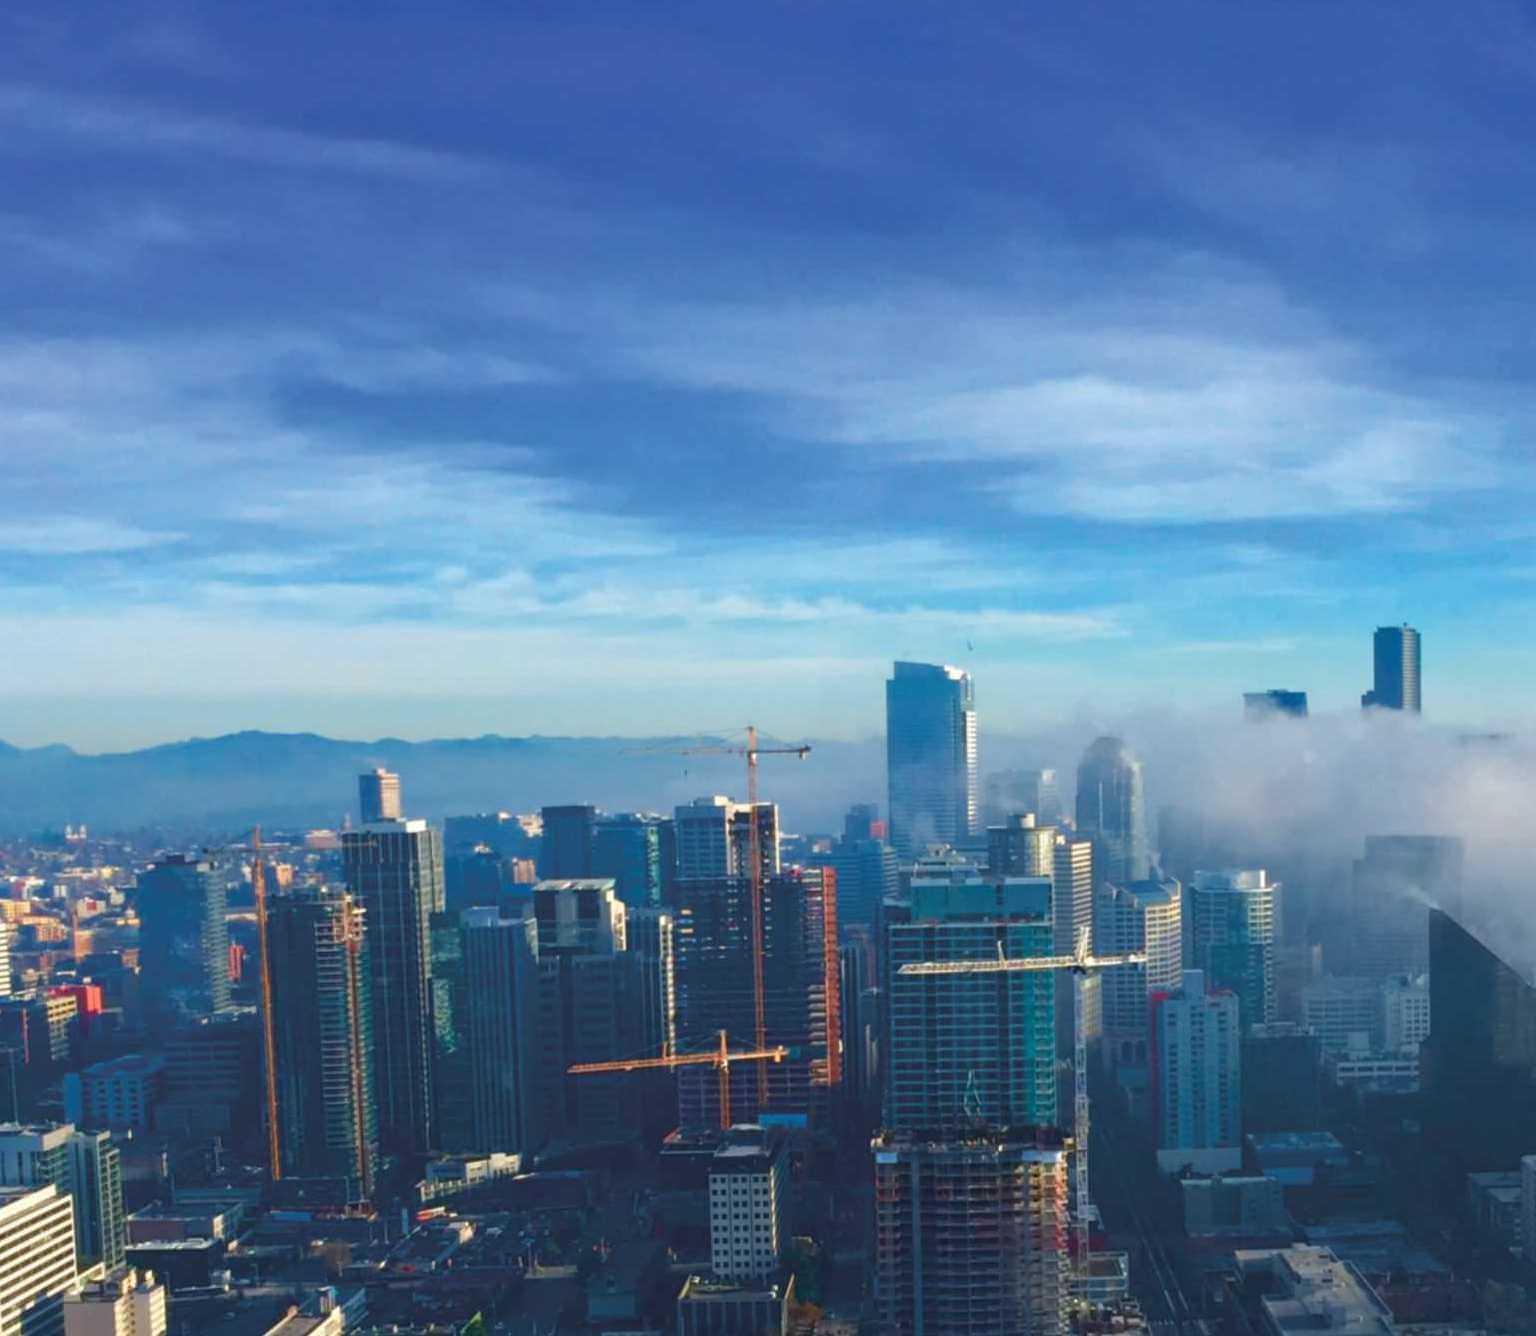 West Coast, Best Coast: A Seattle Symphony